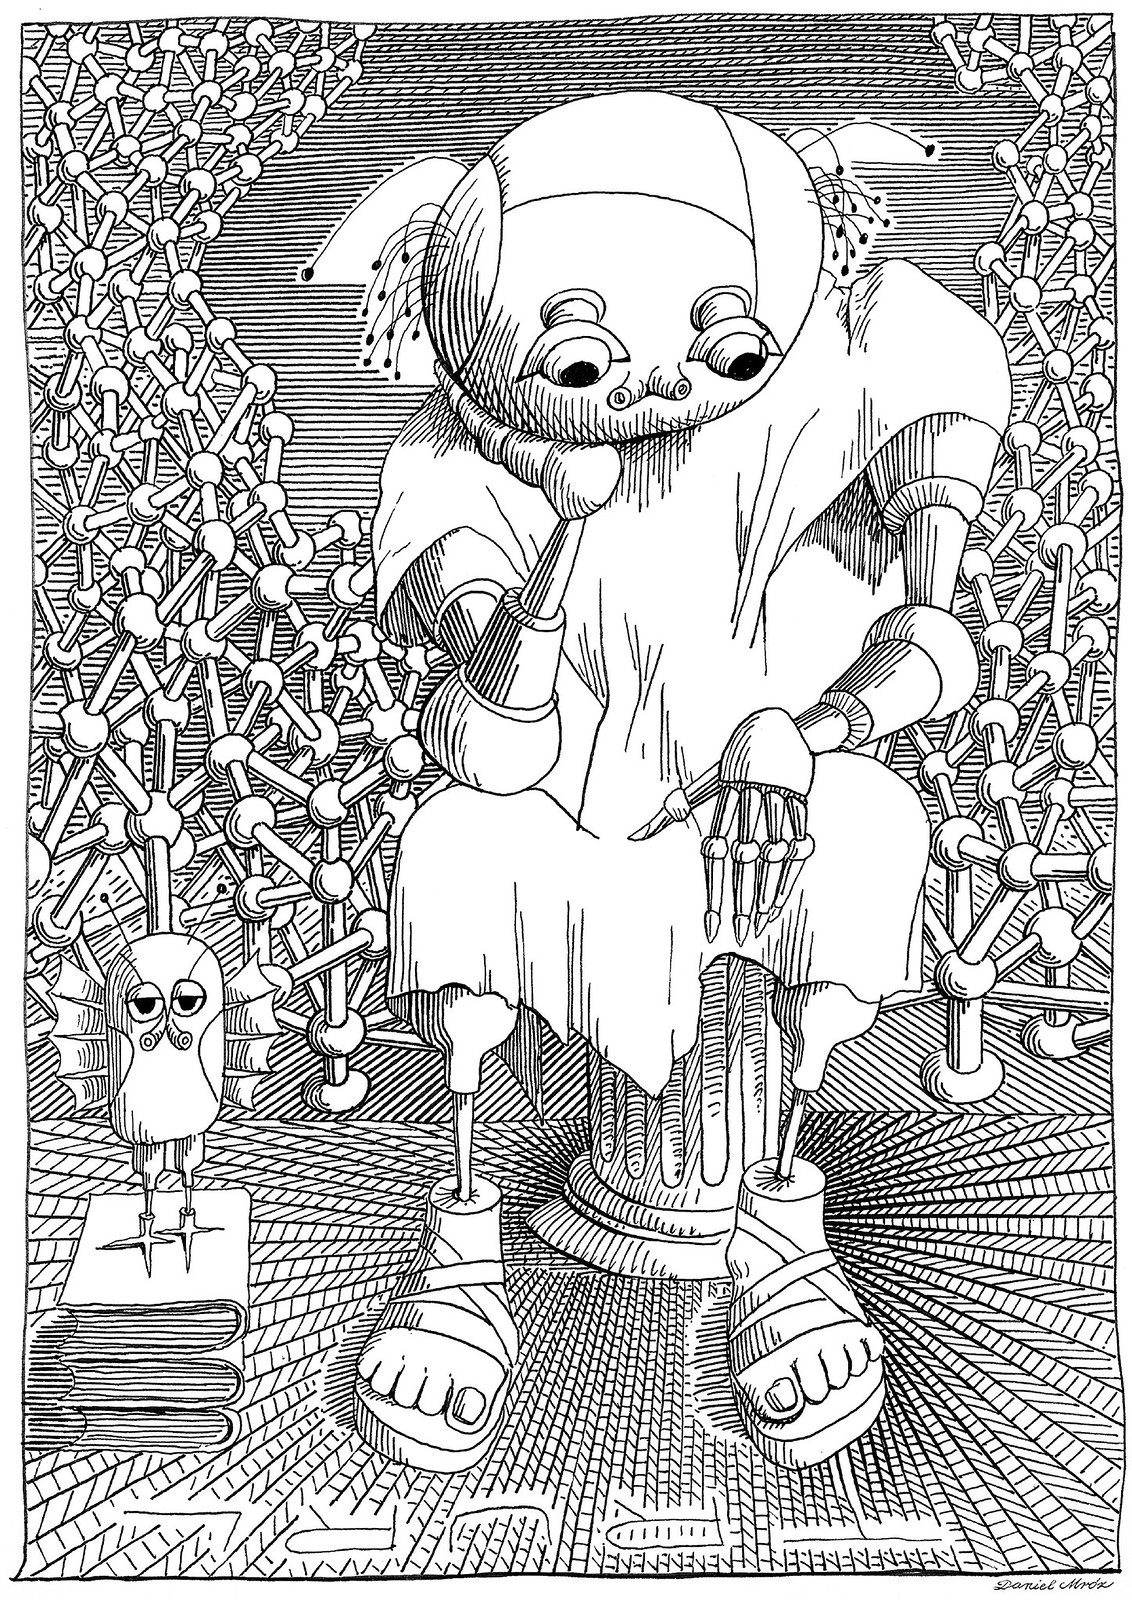 Daniel Mróz - Artwork 6